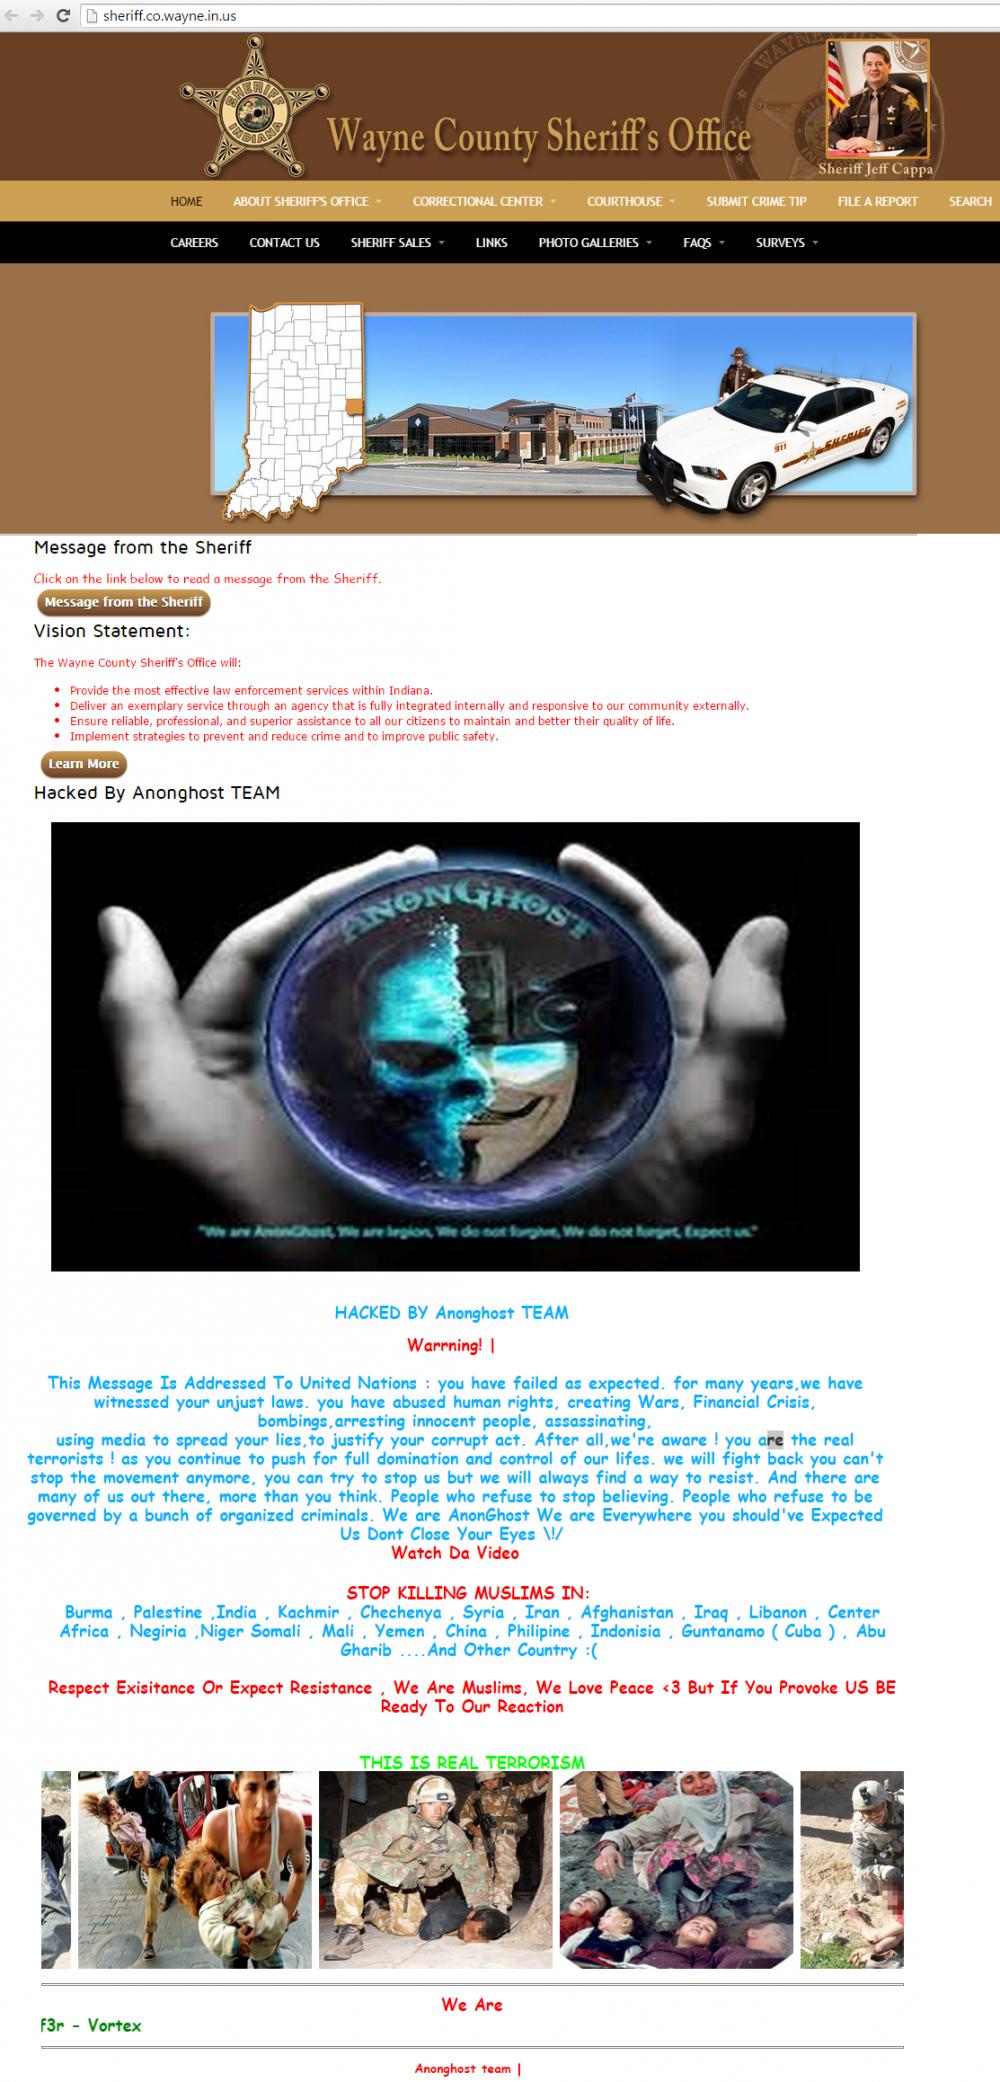 wayne-county-sheriffs-dept-website-defaced-1